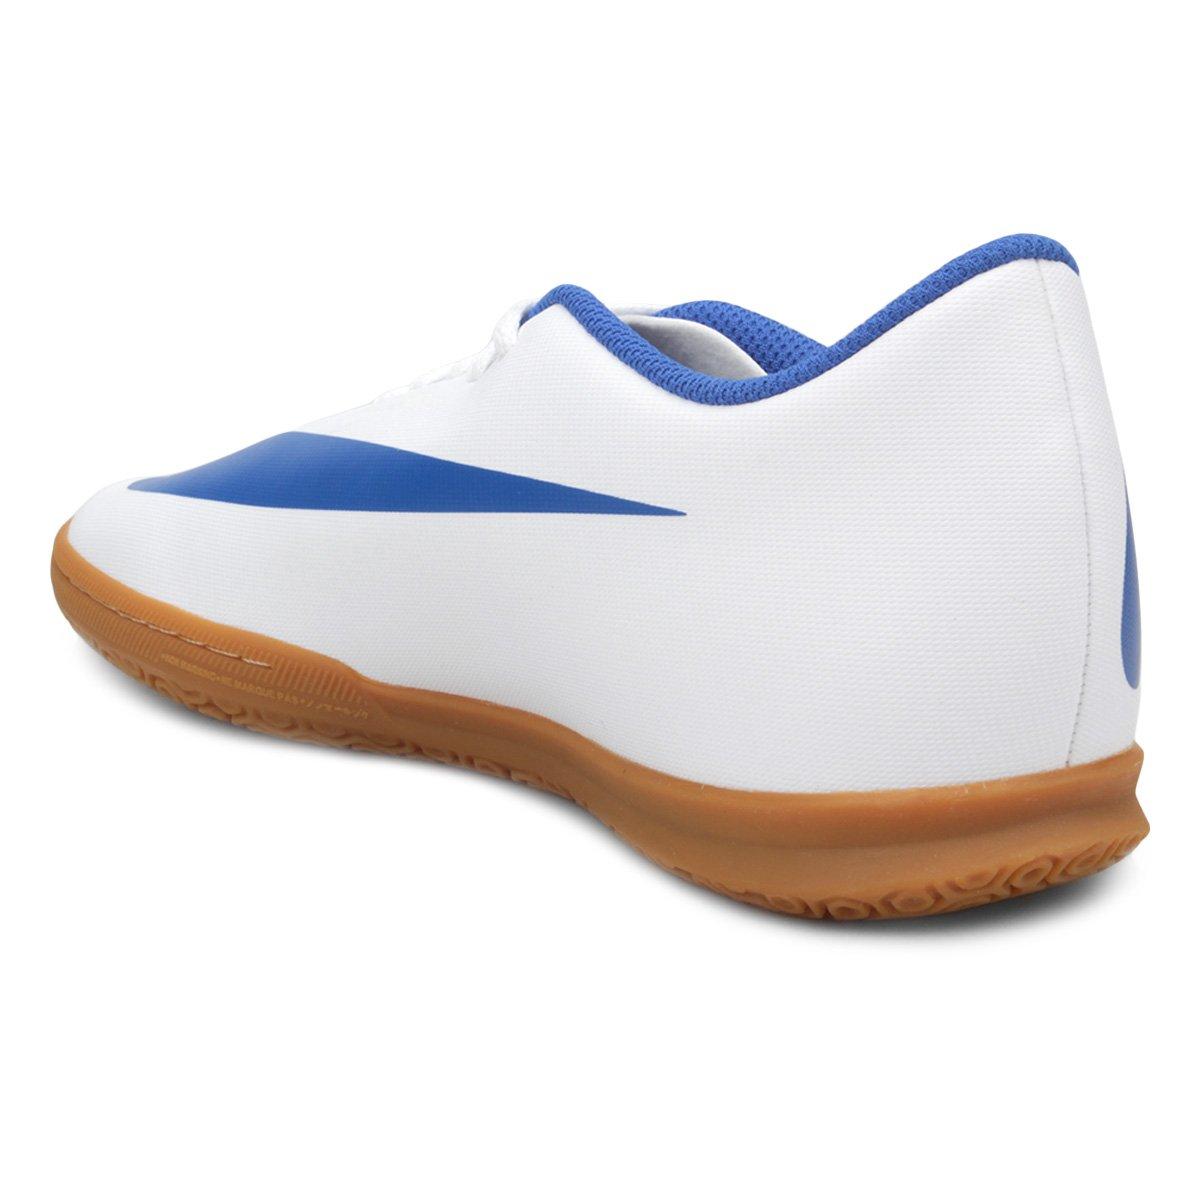 a4cebd0561 ... Azul Chuteira 2 Bravata Branco IC e Nike Masculina Futsal Rw4SRq8 ...